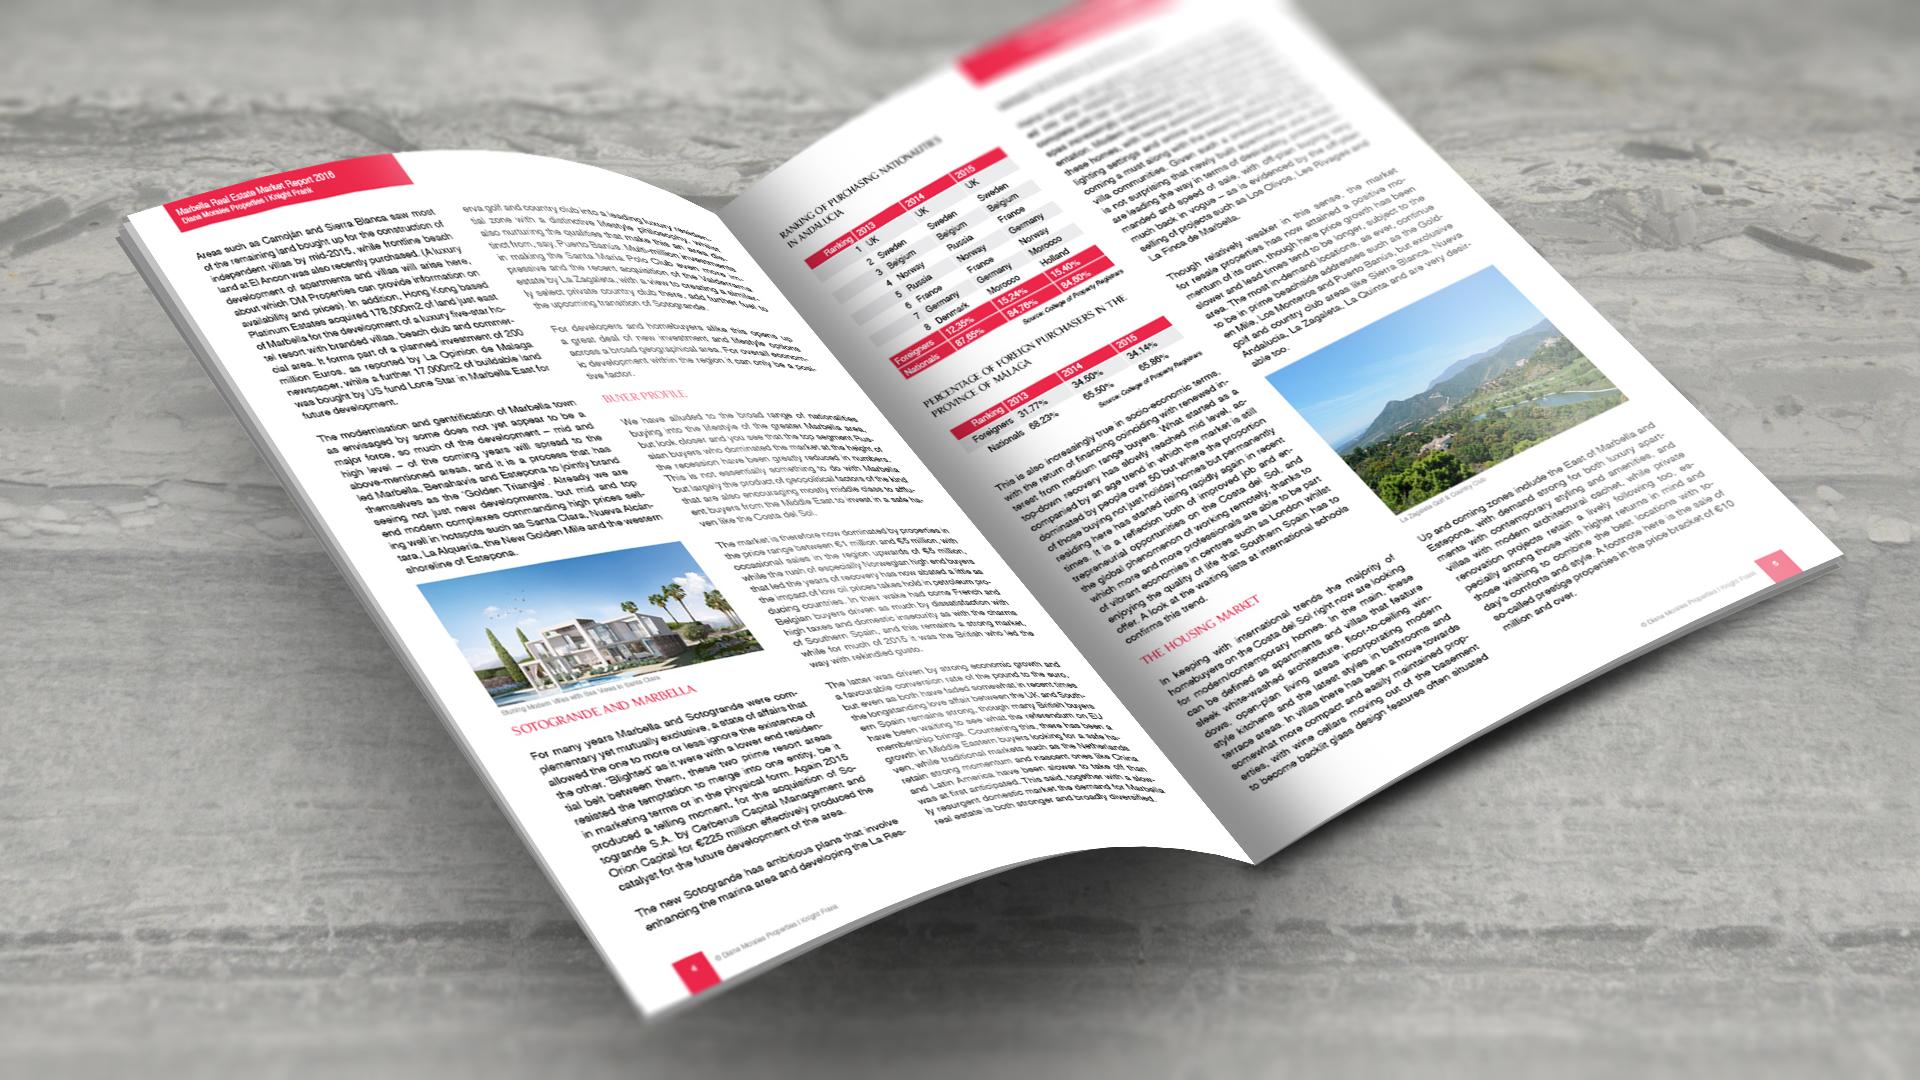 DM Properties Knight Frank 2016 Marbella Market Report